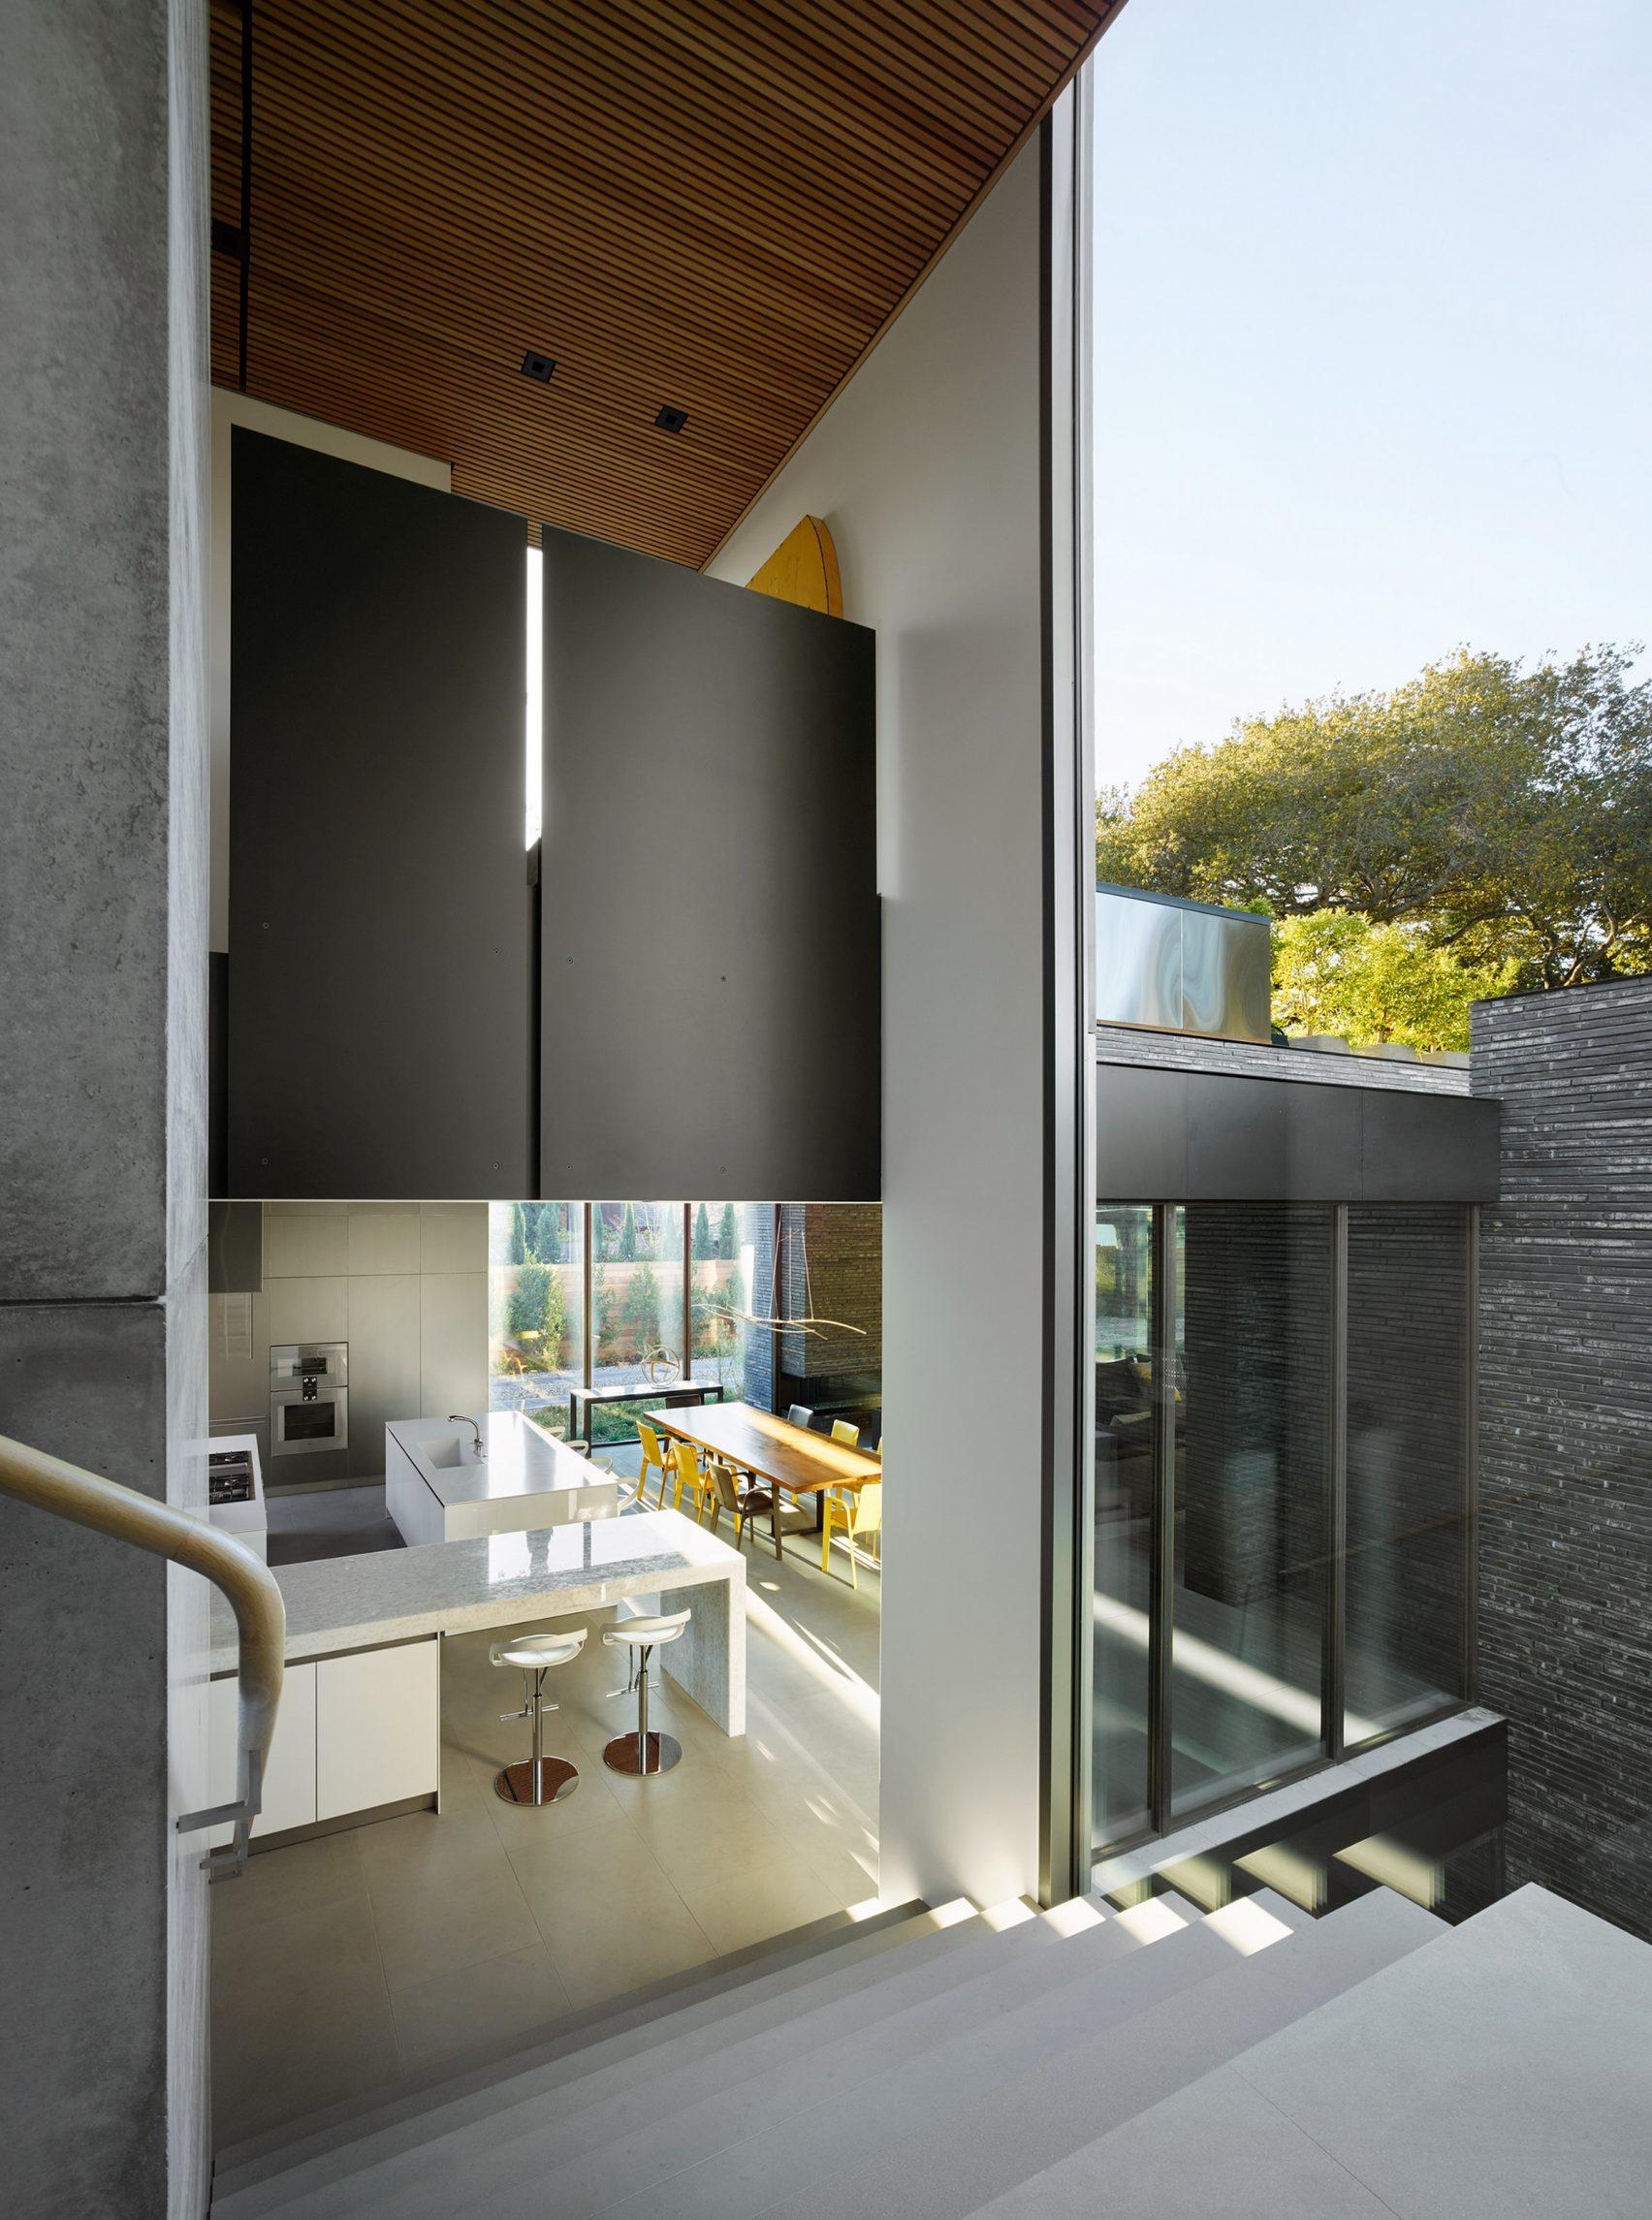 Waverley Residence by EYRC